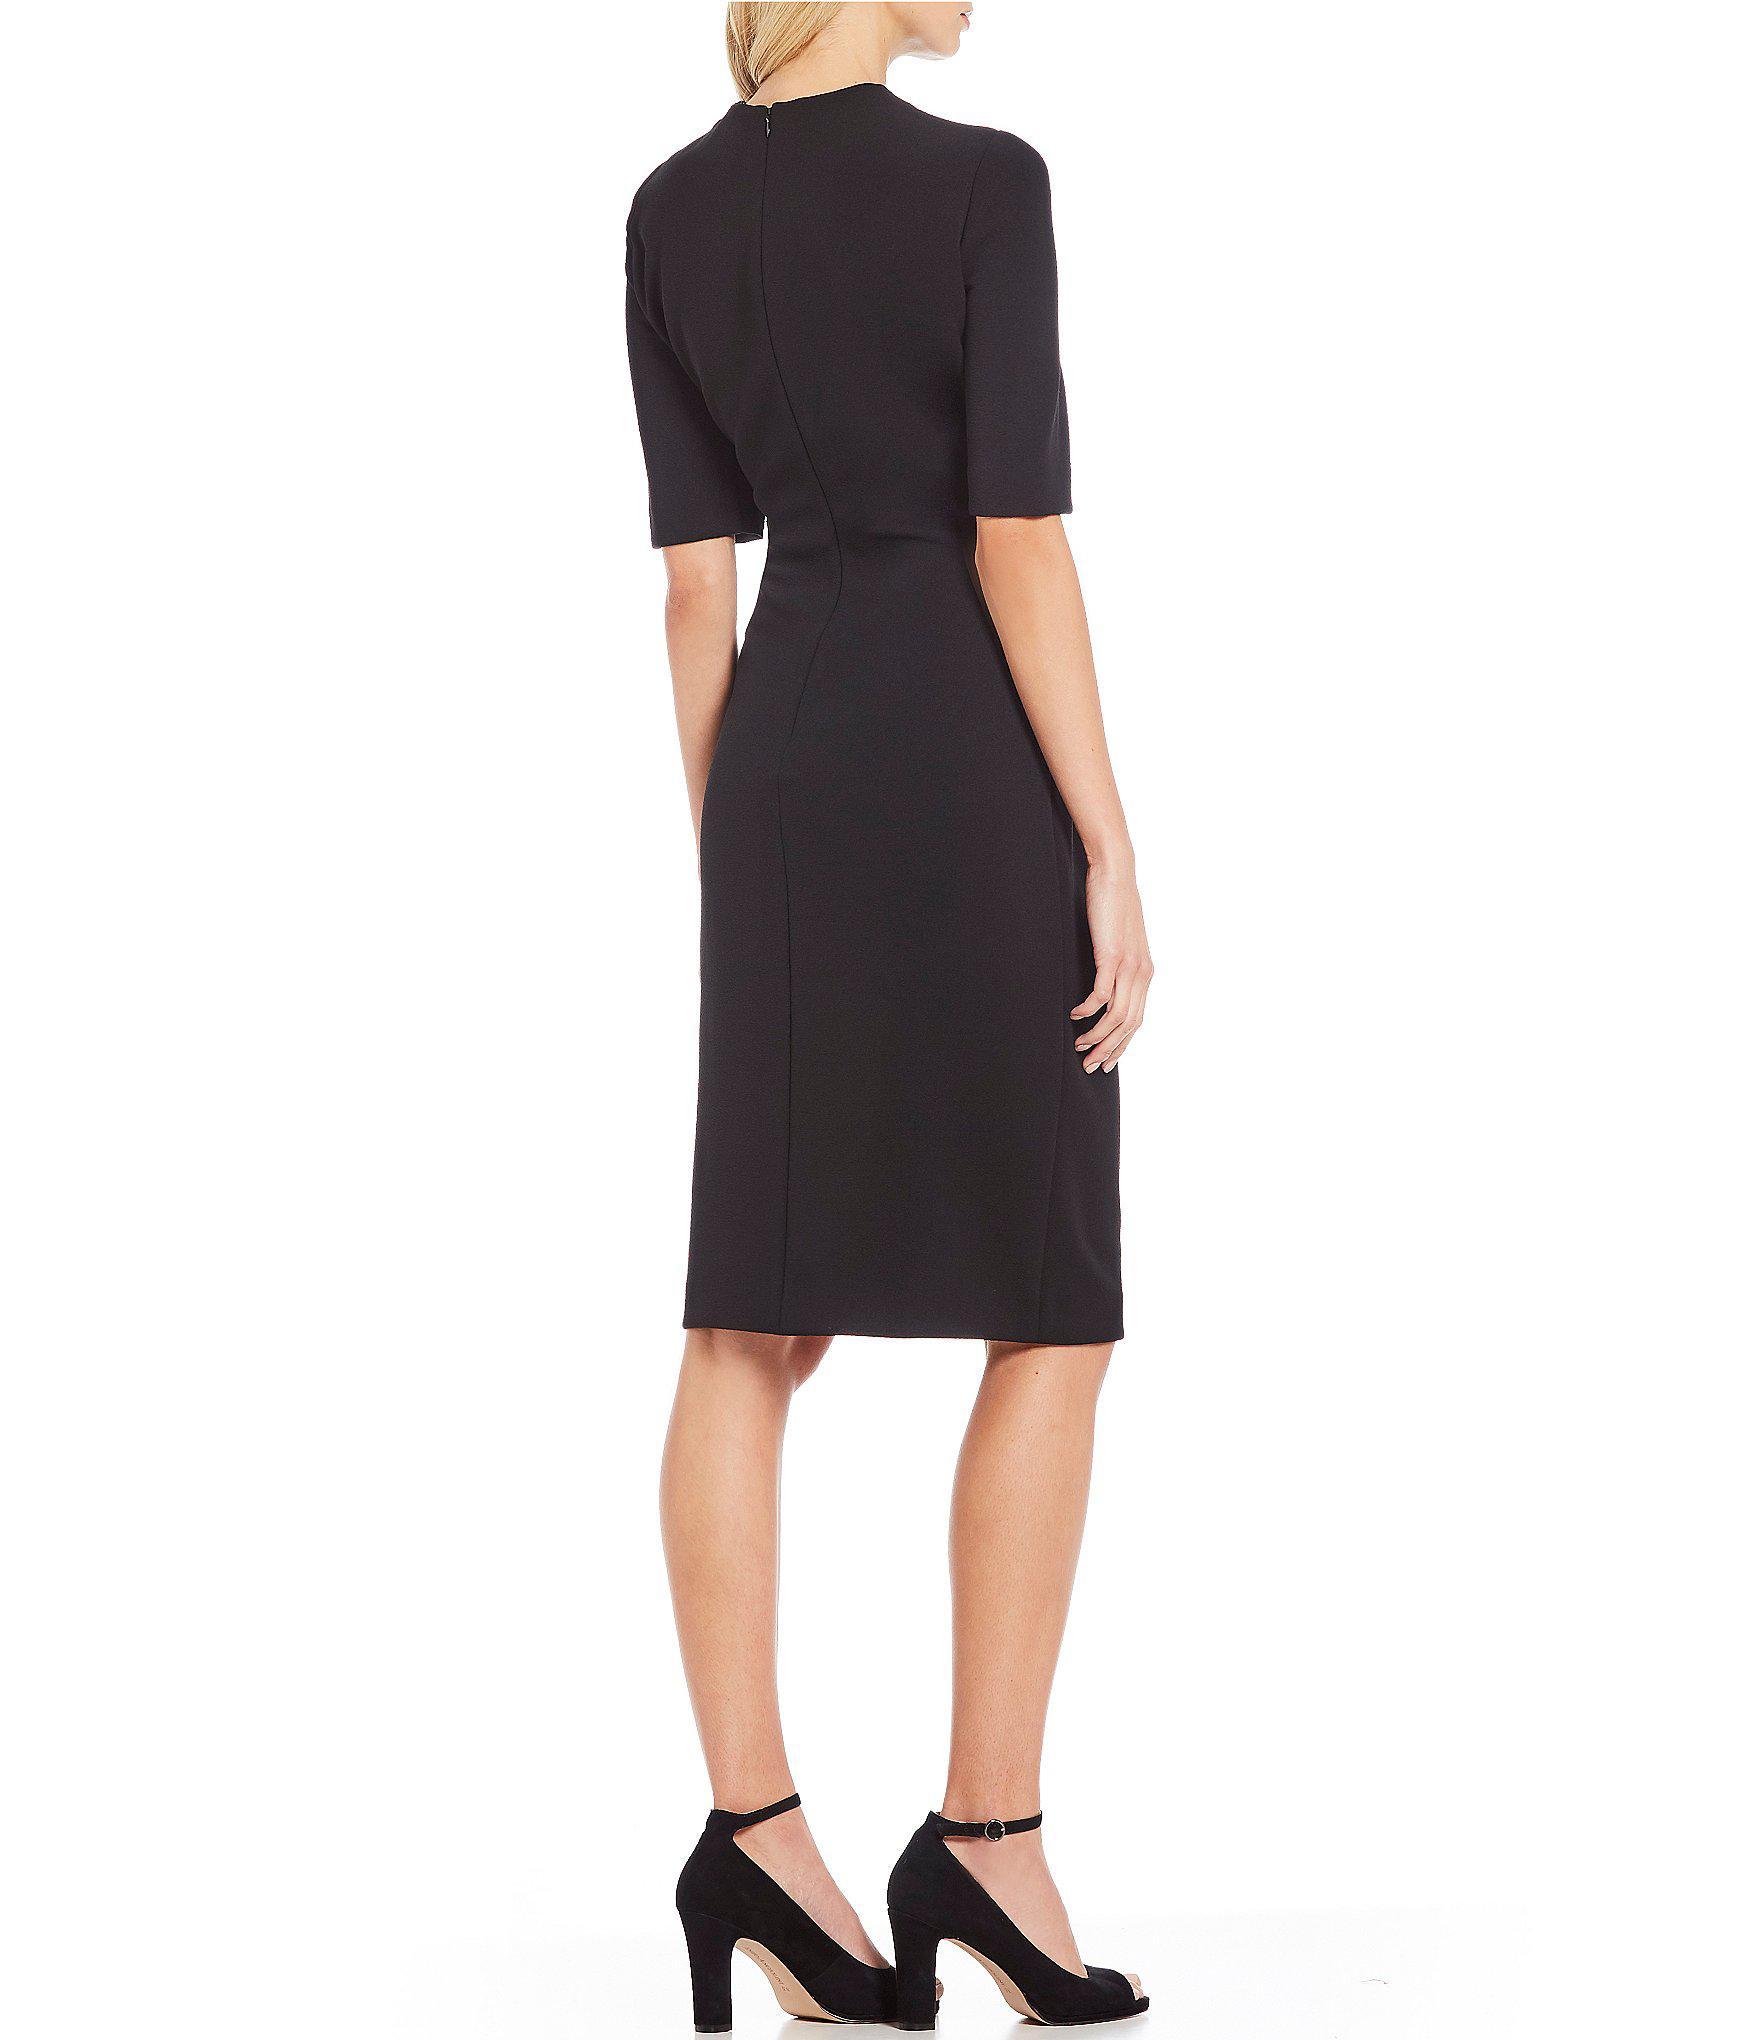 56f1512bdc76c Tahari Surplice Ruched Crepe Sheath Dress in Black - Save 45% - Lyst